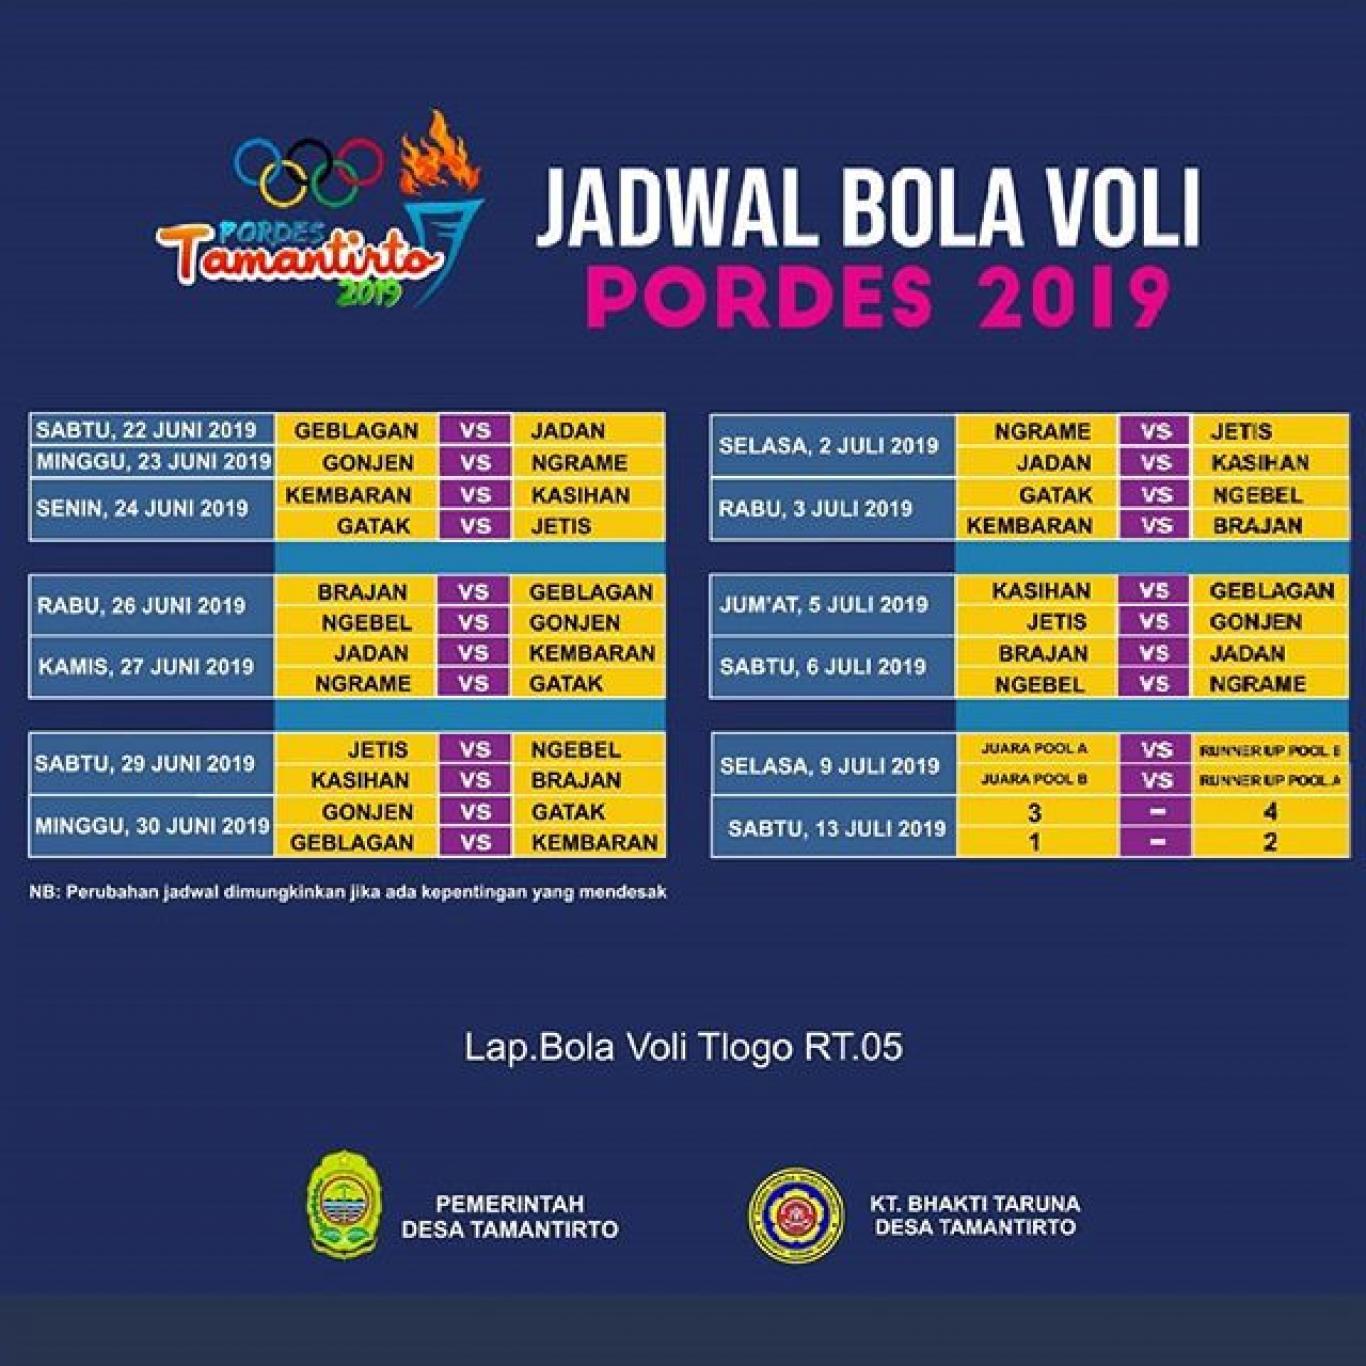 Berikut Jadwal Pertandingan Bola Voli Di Pordes Tamantirto